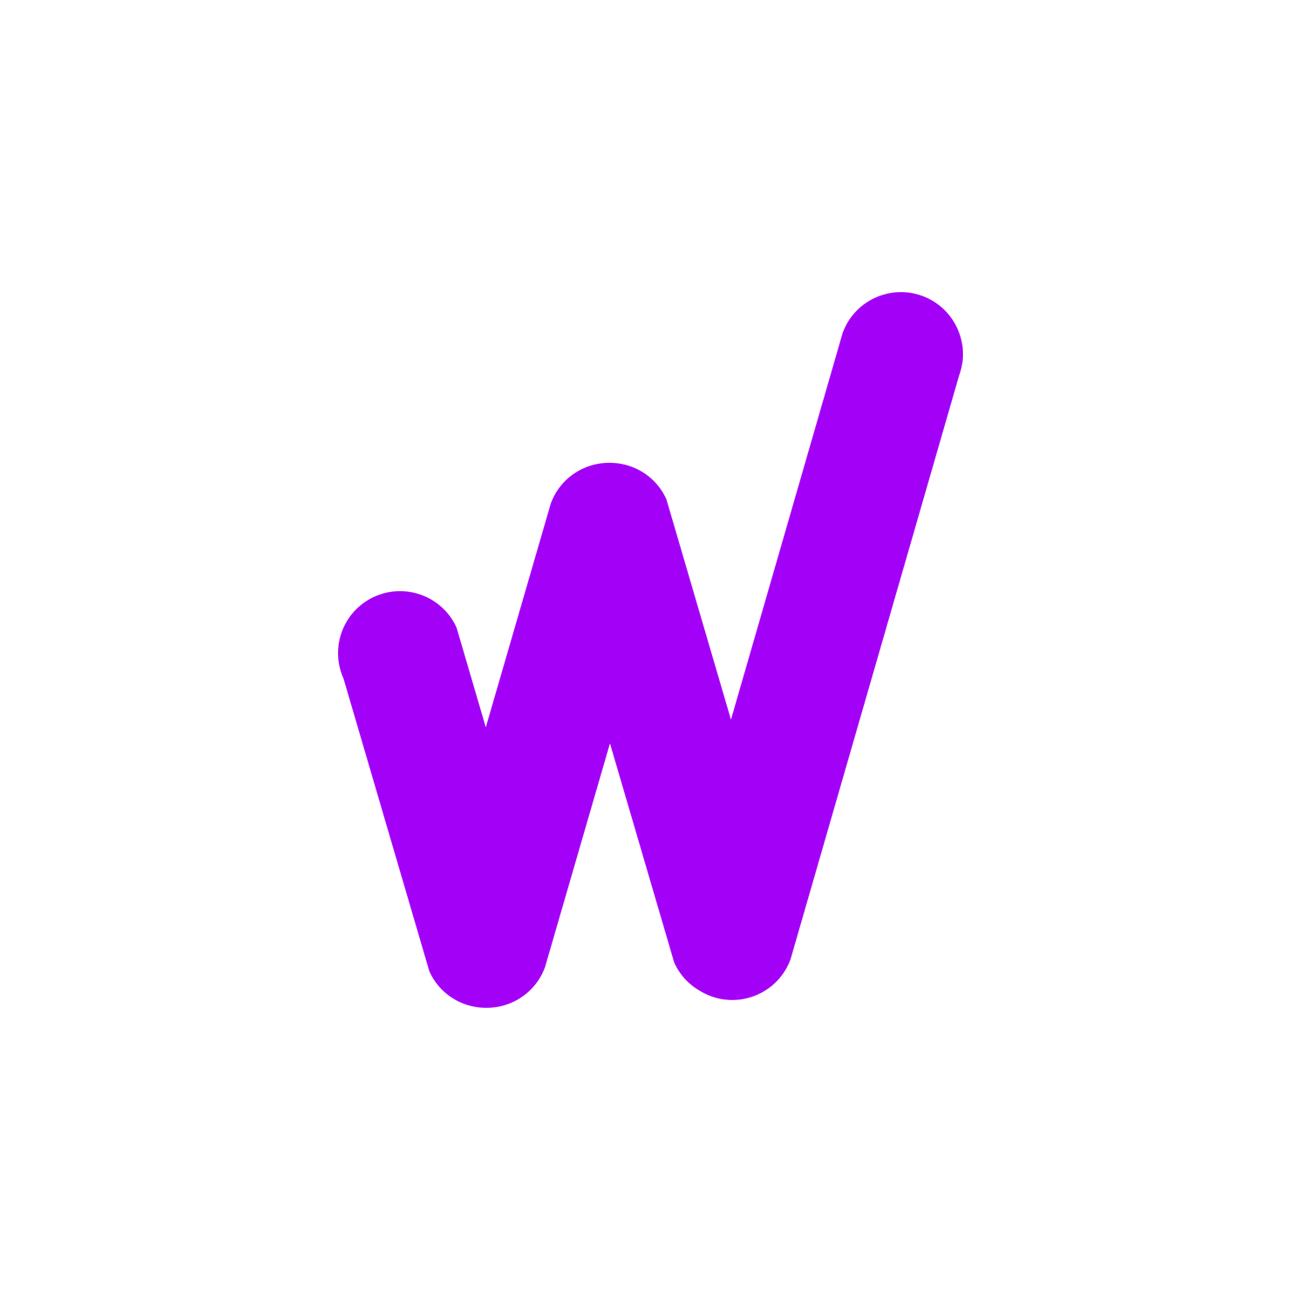 Wiuwi